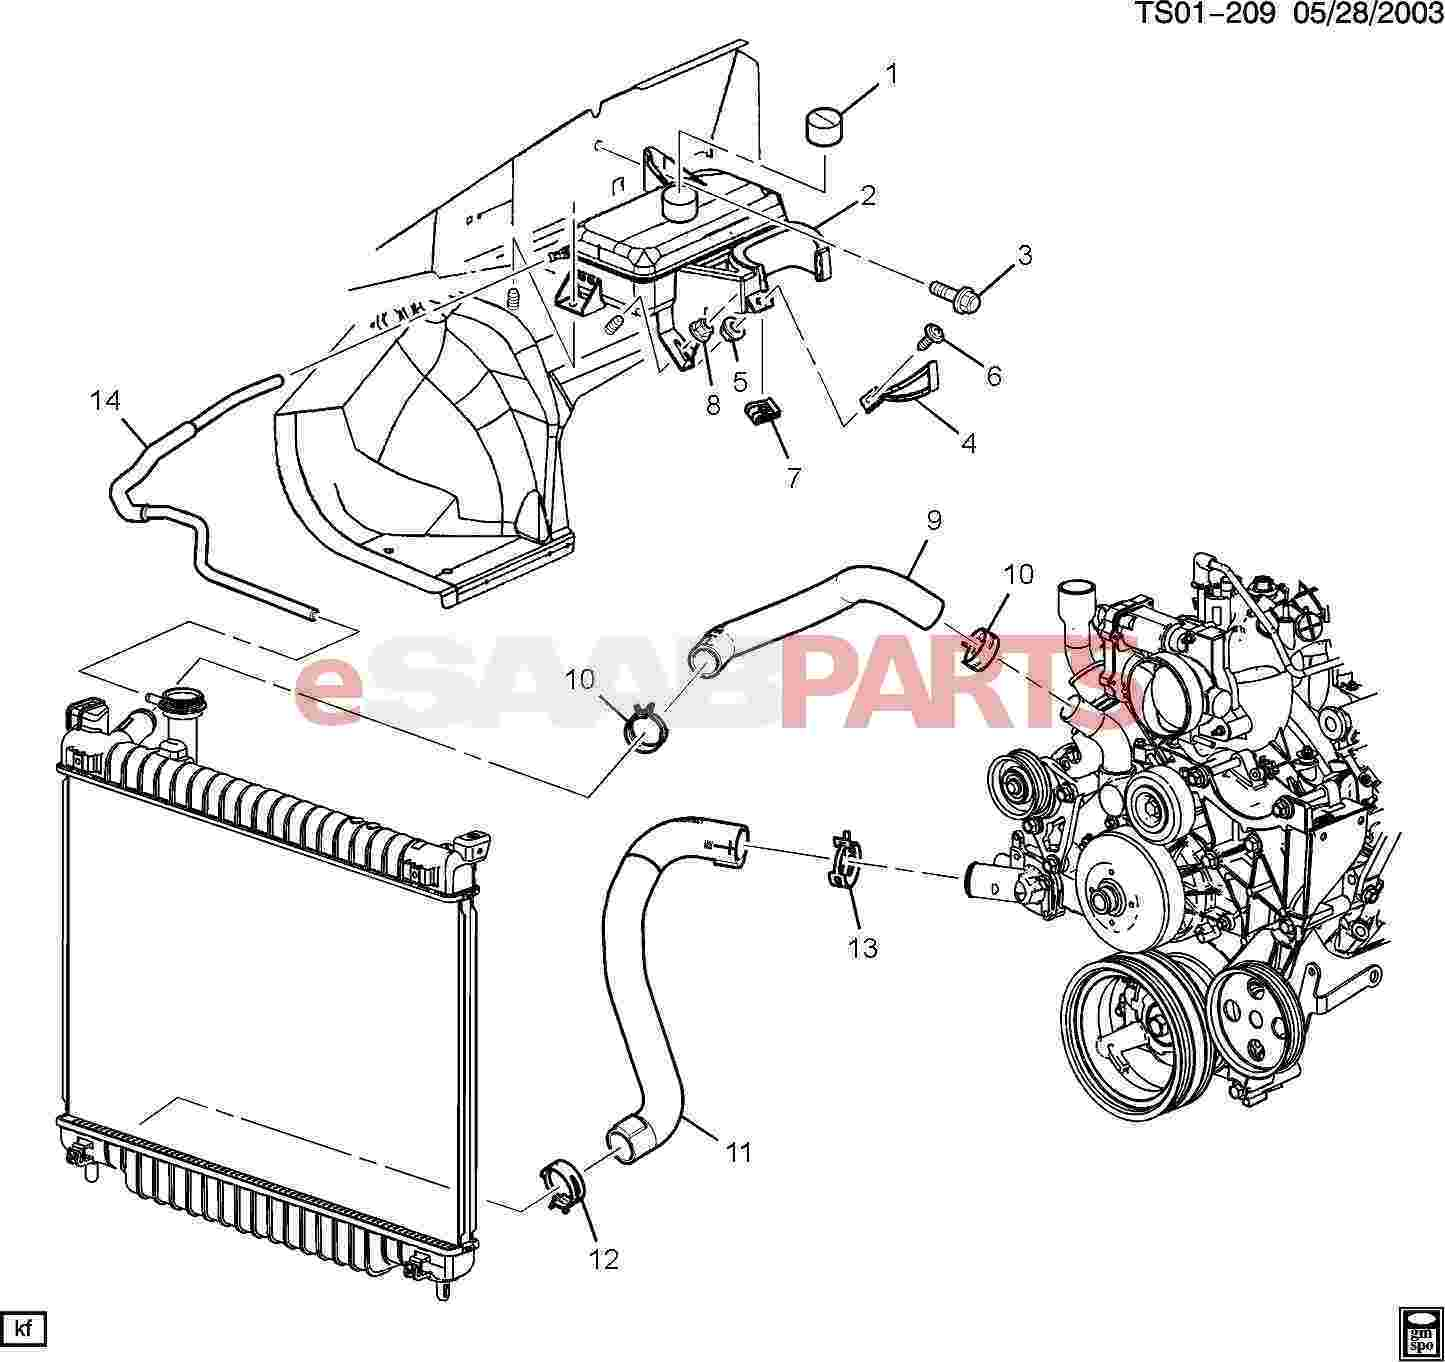 eSaabParts.com - Saab 9-7x > Engine Parts > Heater Hoses, Radiator & Fans >  Radiator Hoses (5.3M)eSaabParts.com